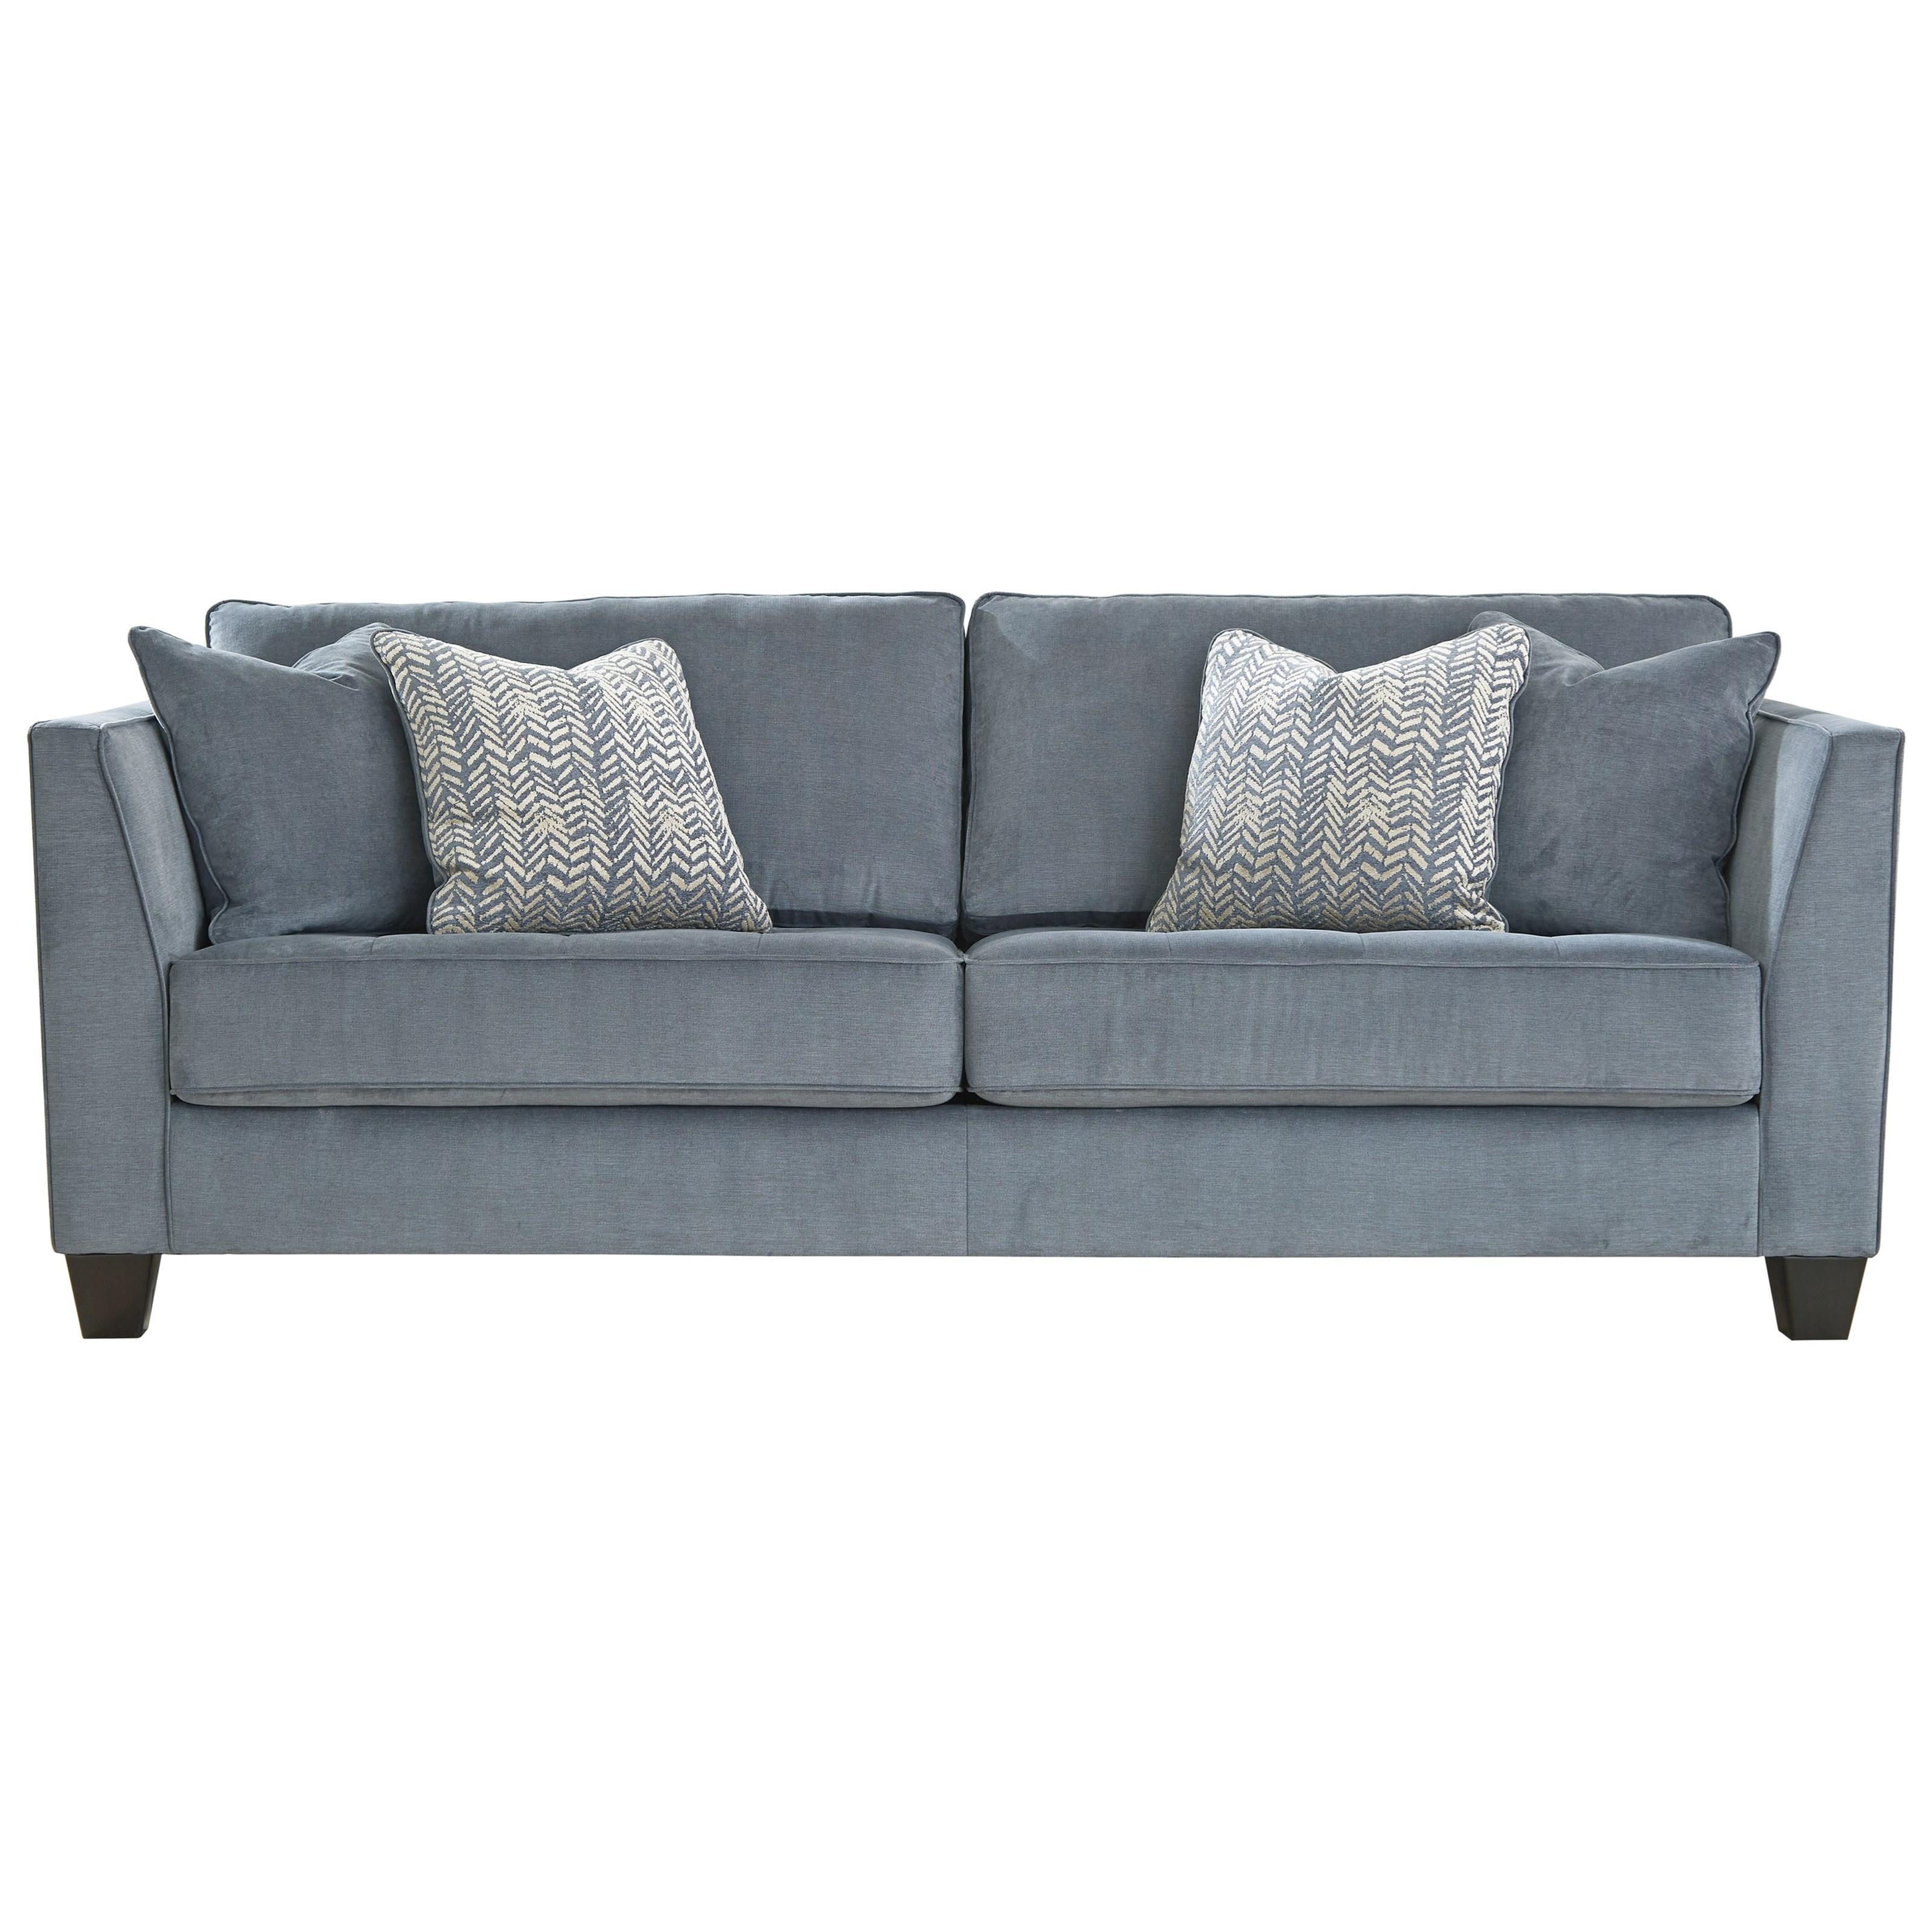 Sciolo Sofa by Ashley Furniture at Lucas Furniture & Mattress